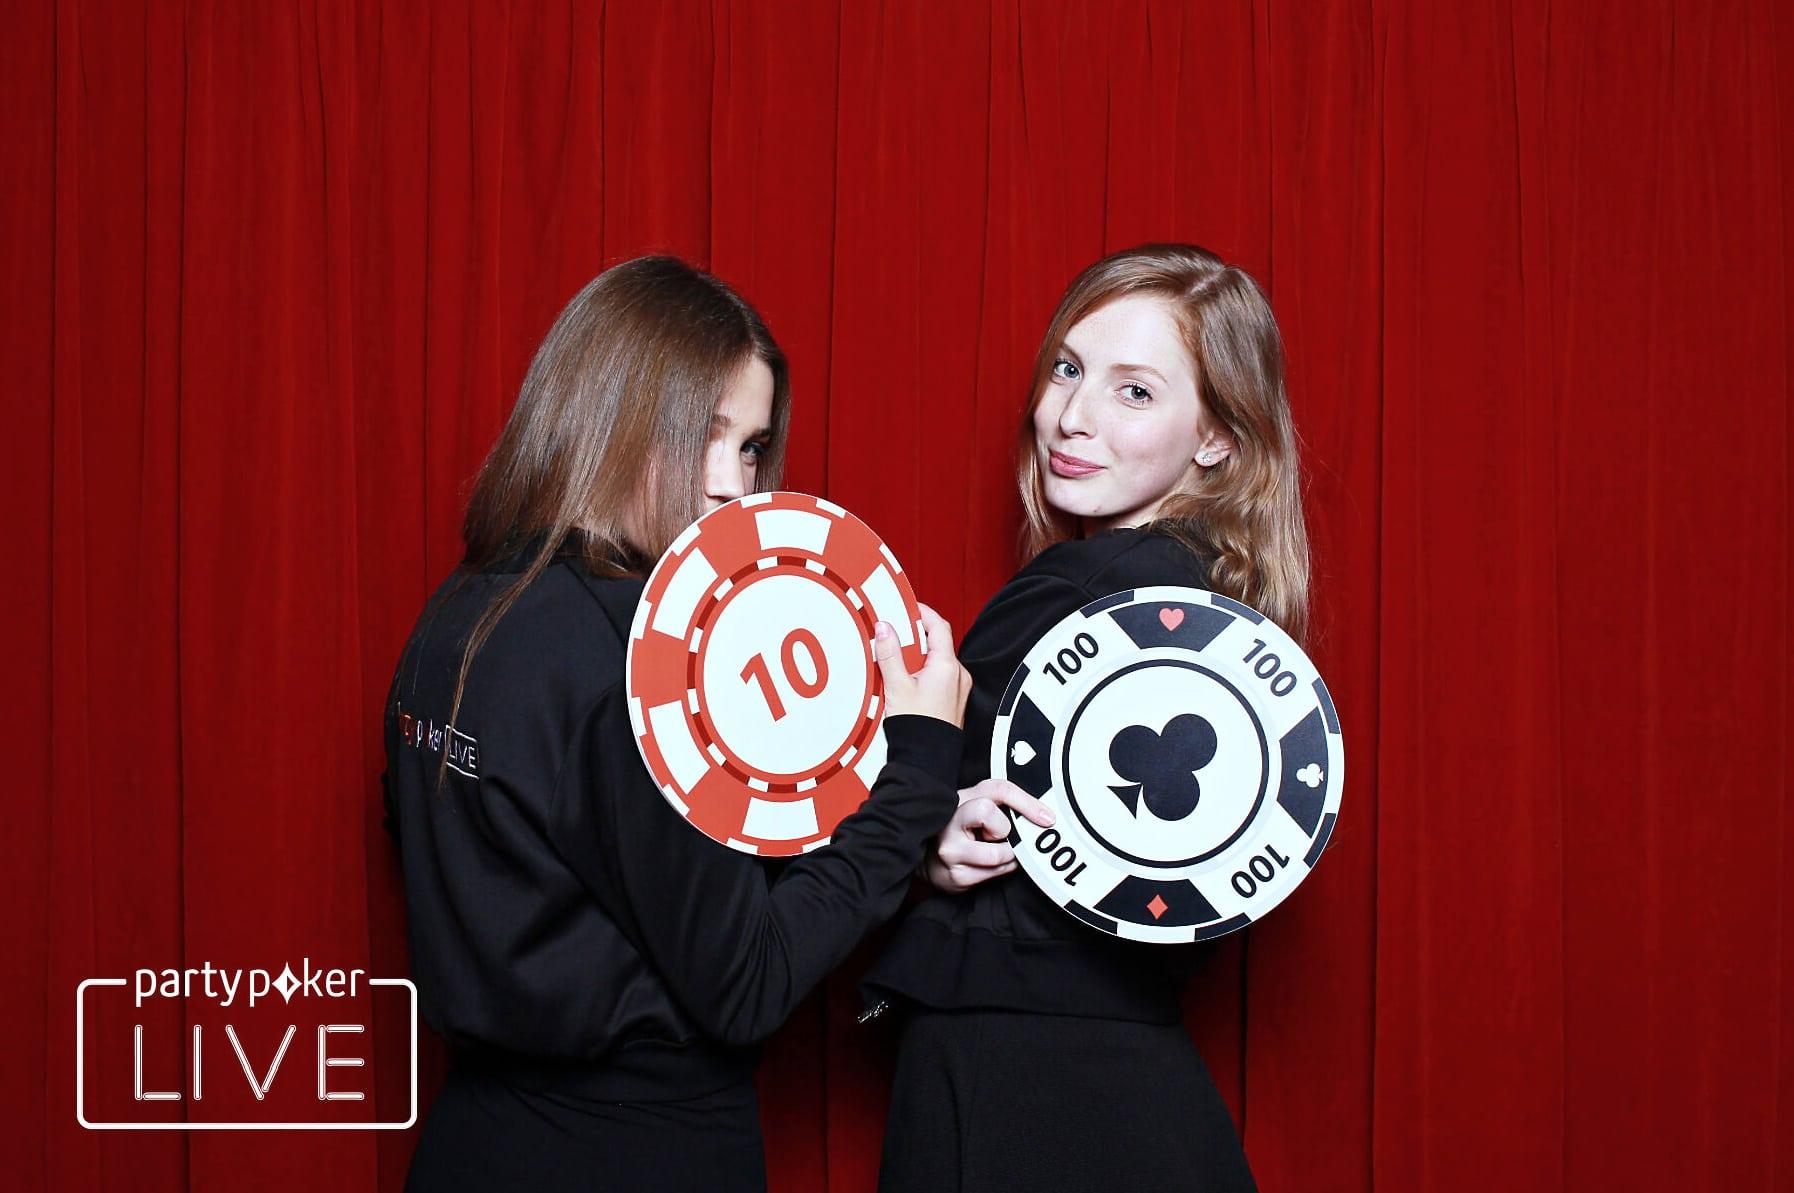 fotokoutek-party-poker-live-23-6-2018-443651